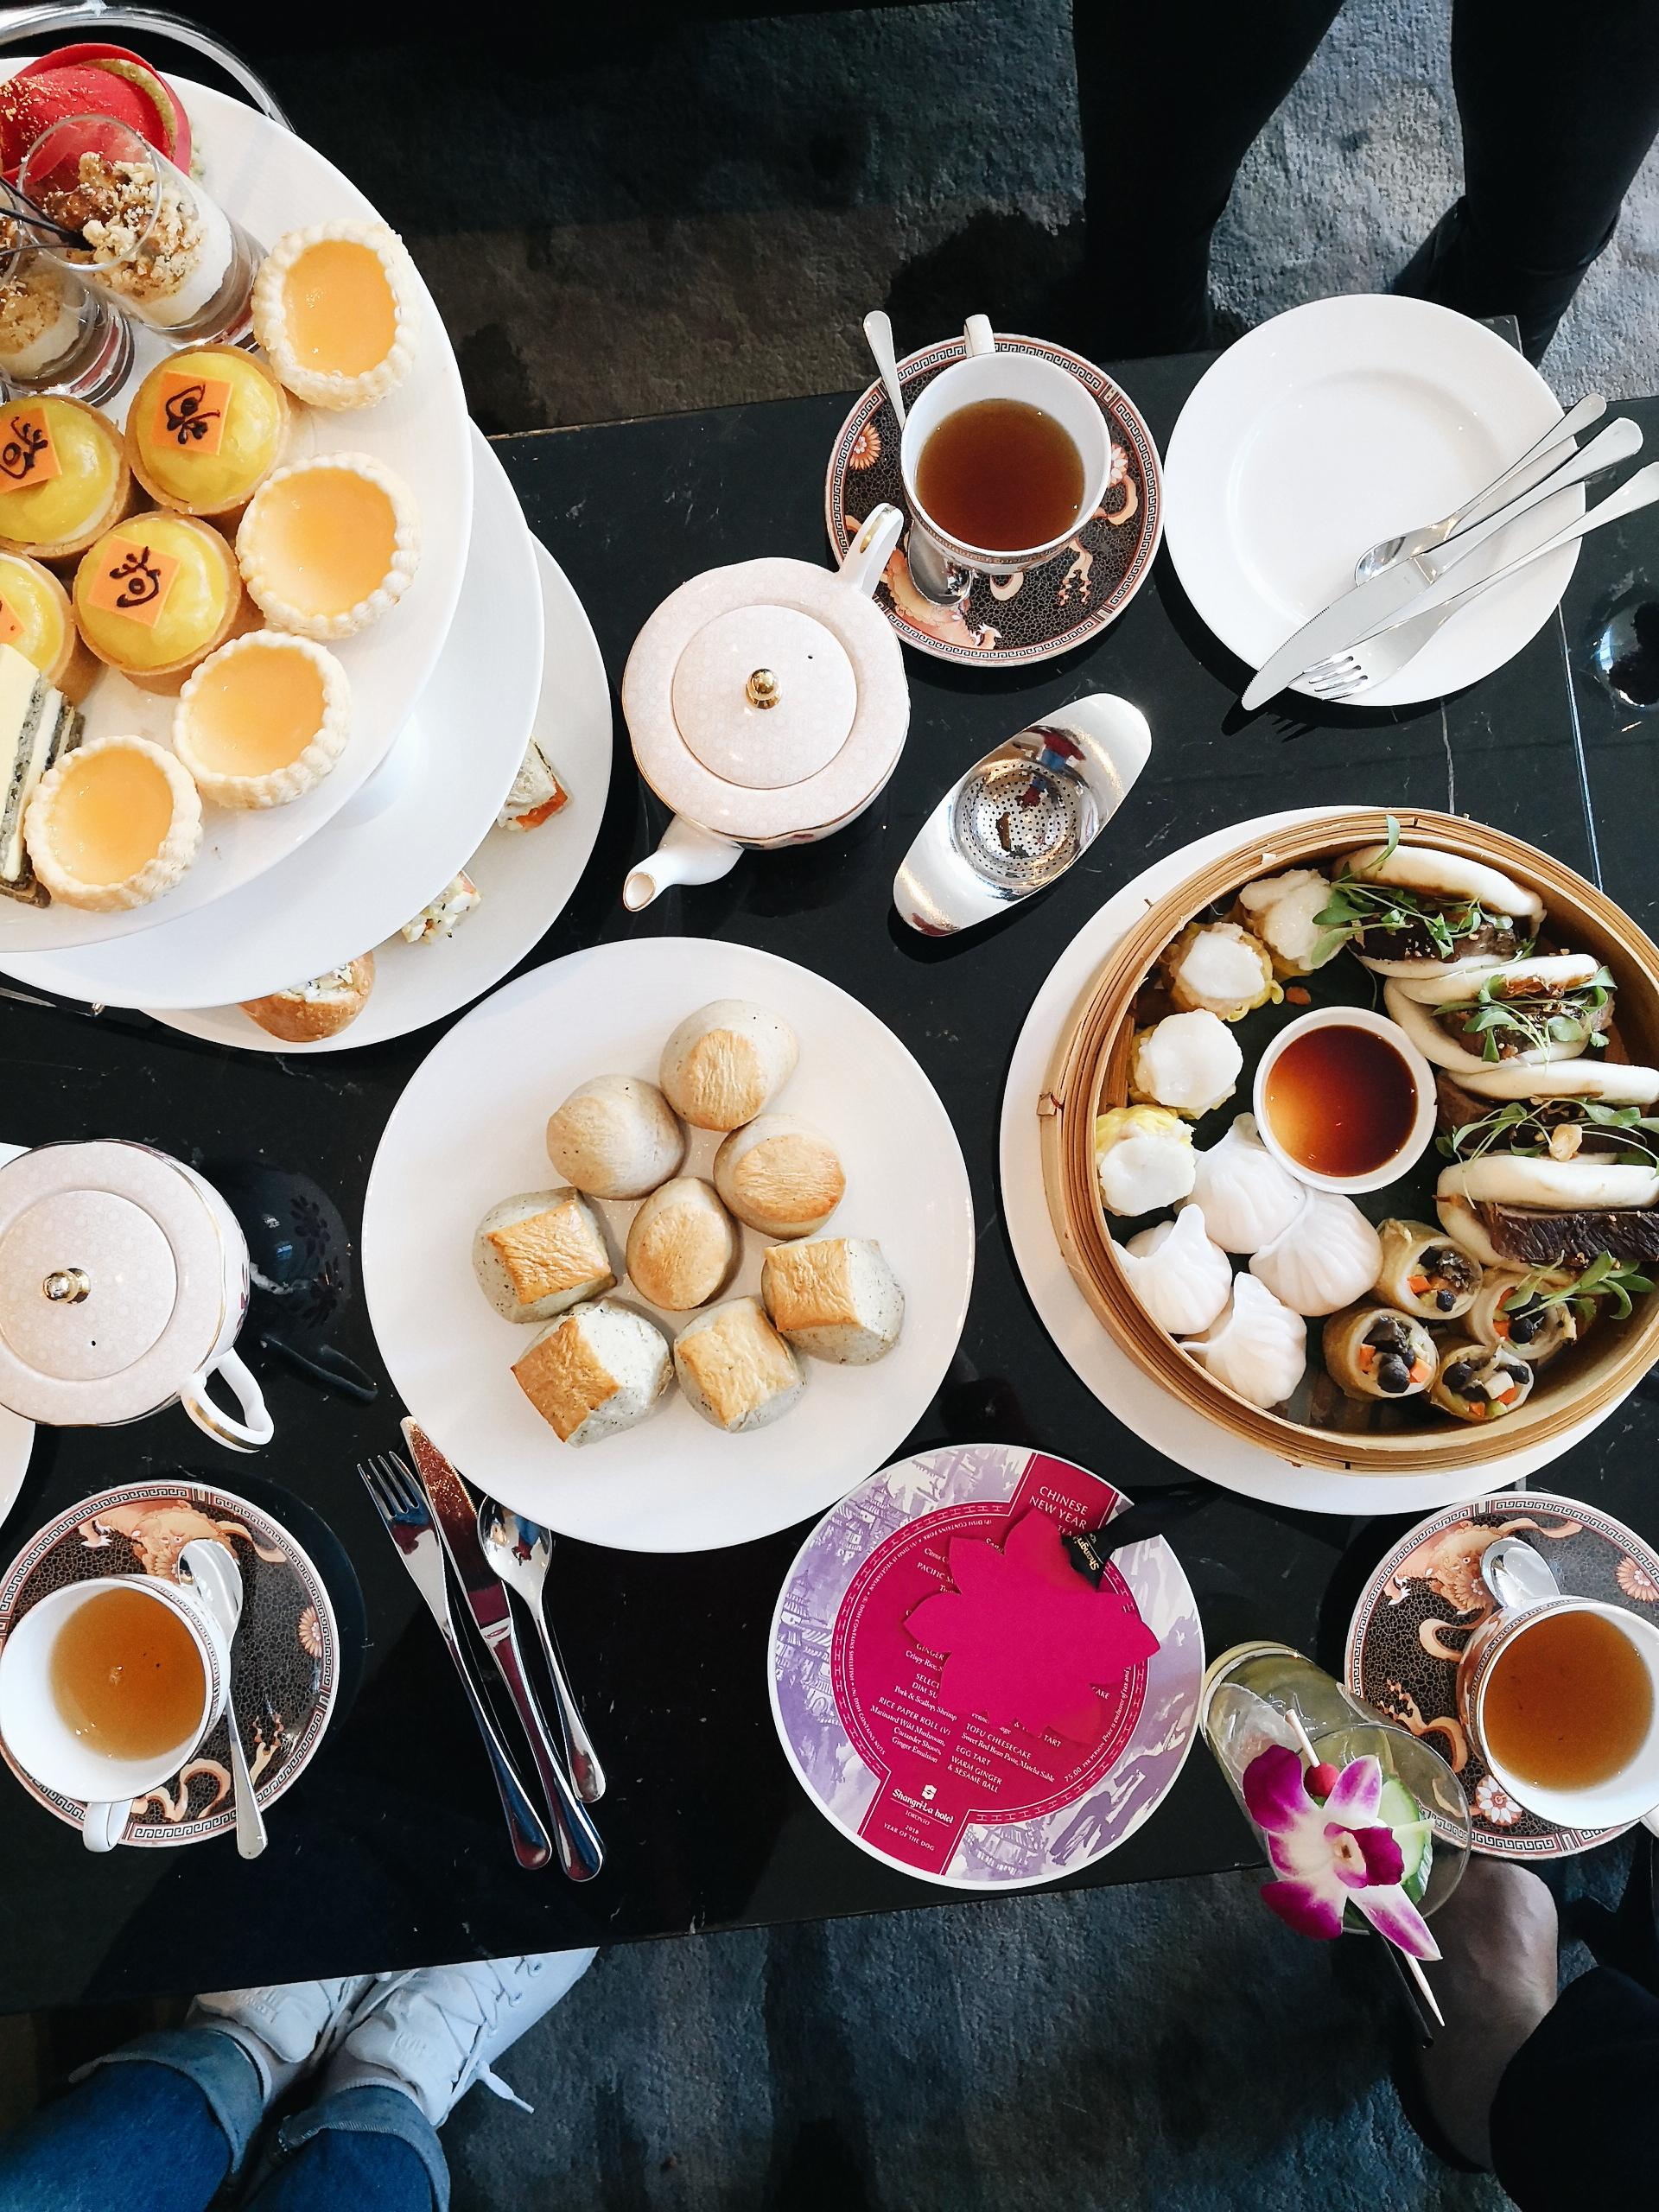 shangri-la-toronto-afternoon-tea-chinese-new-year-03.jpg